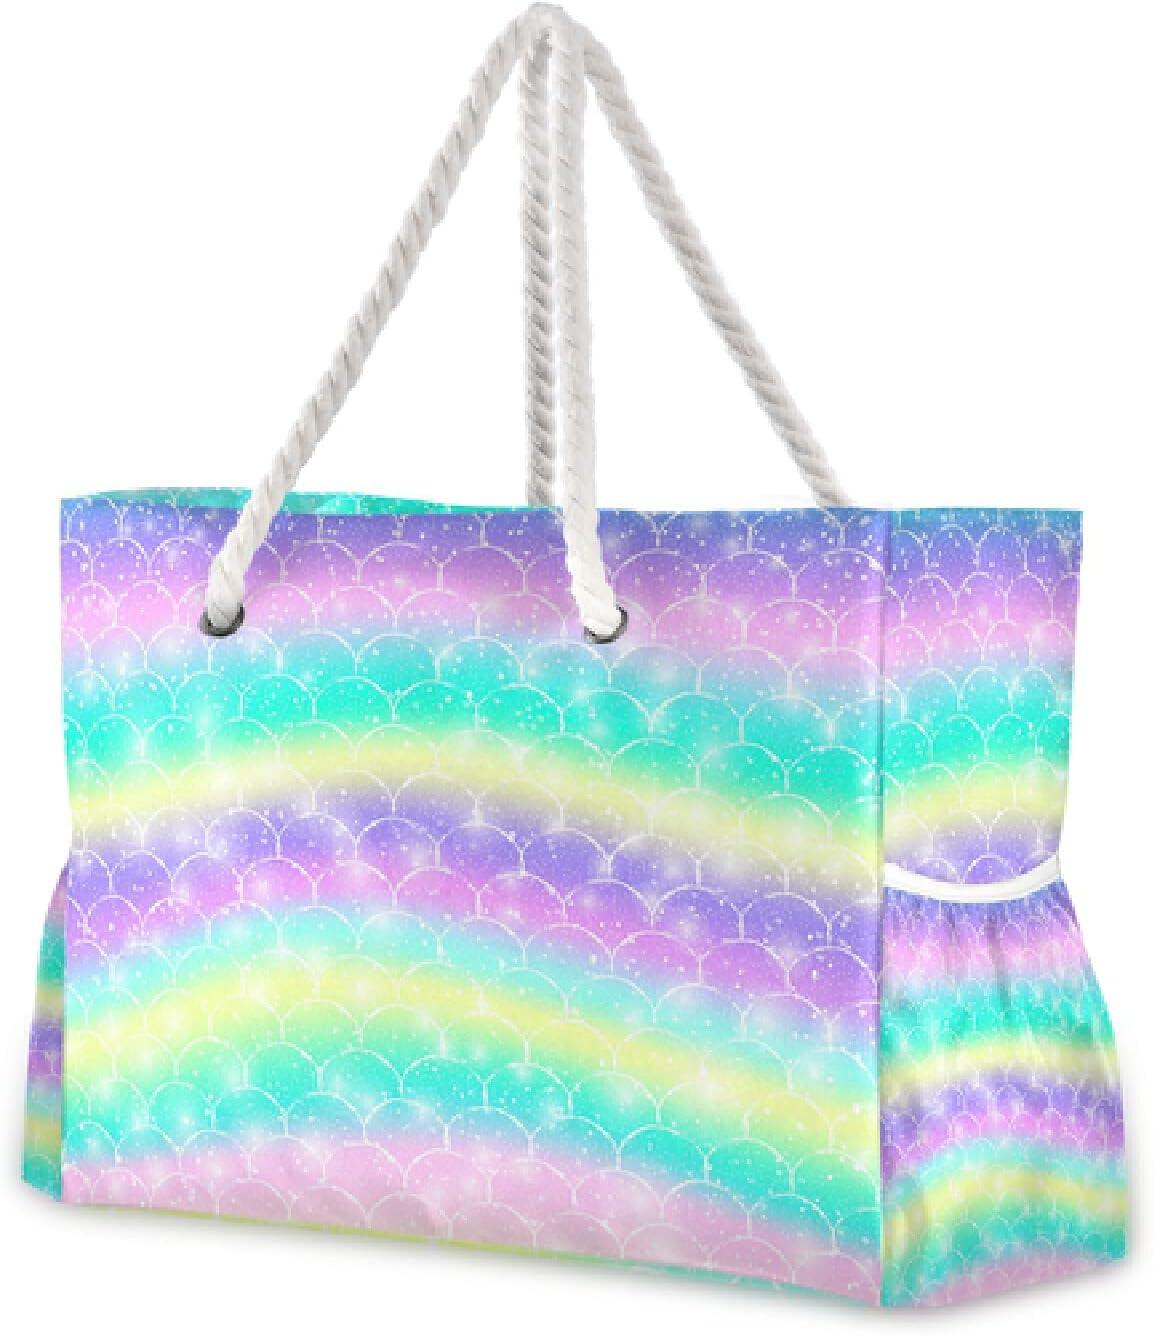 OTVEE Fresno Mall Fantasy Colorful Mermaid Sale Scales Tot Travel Large Bag Beach